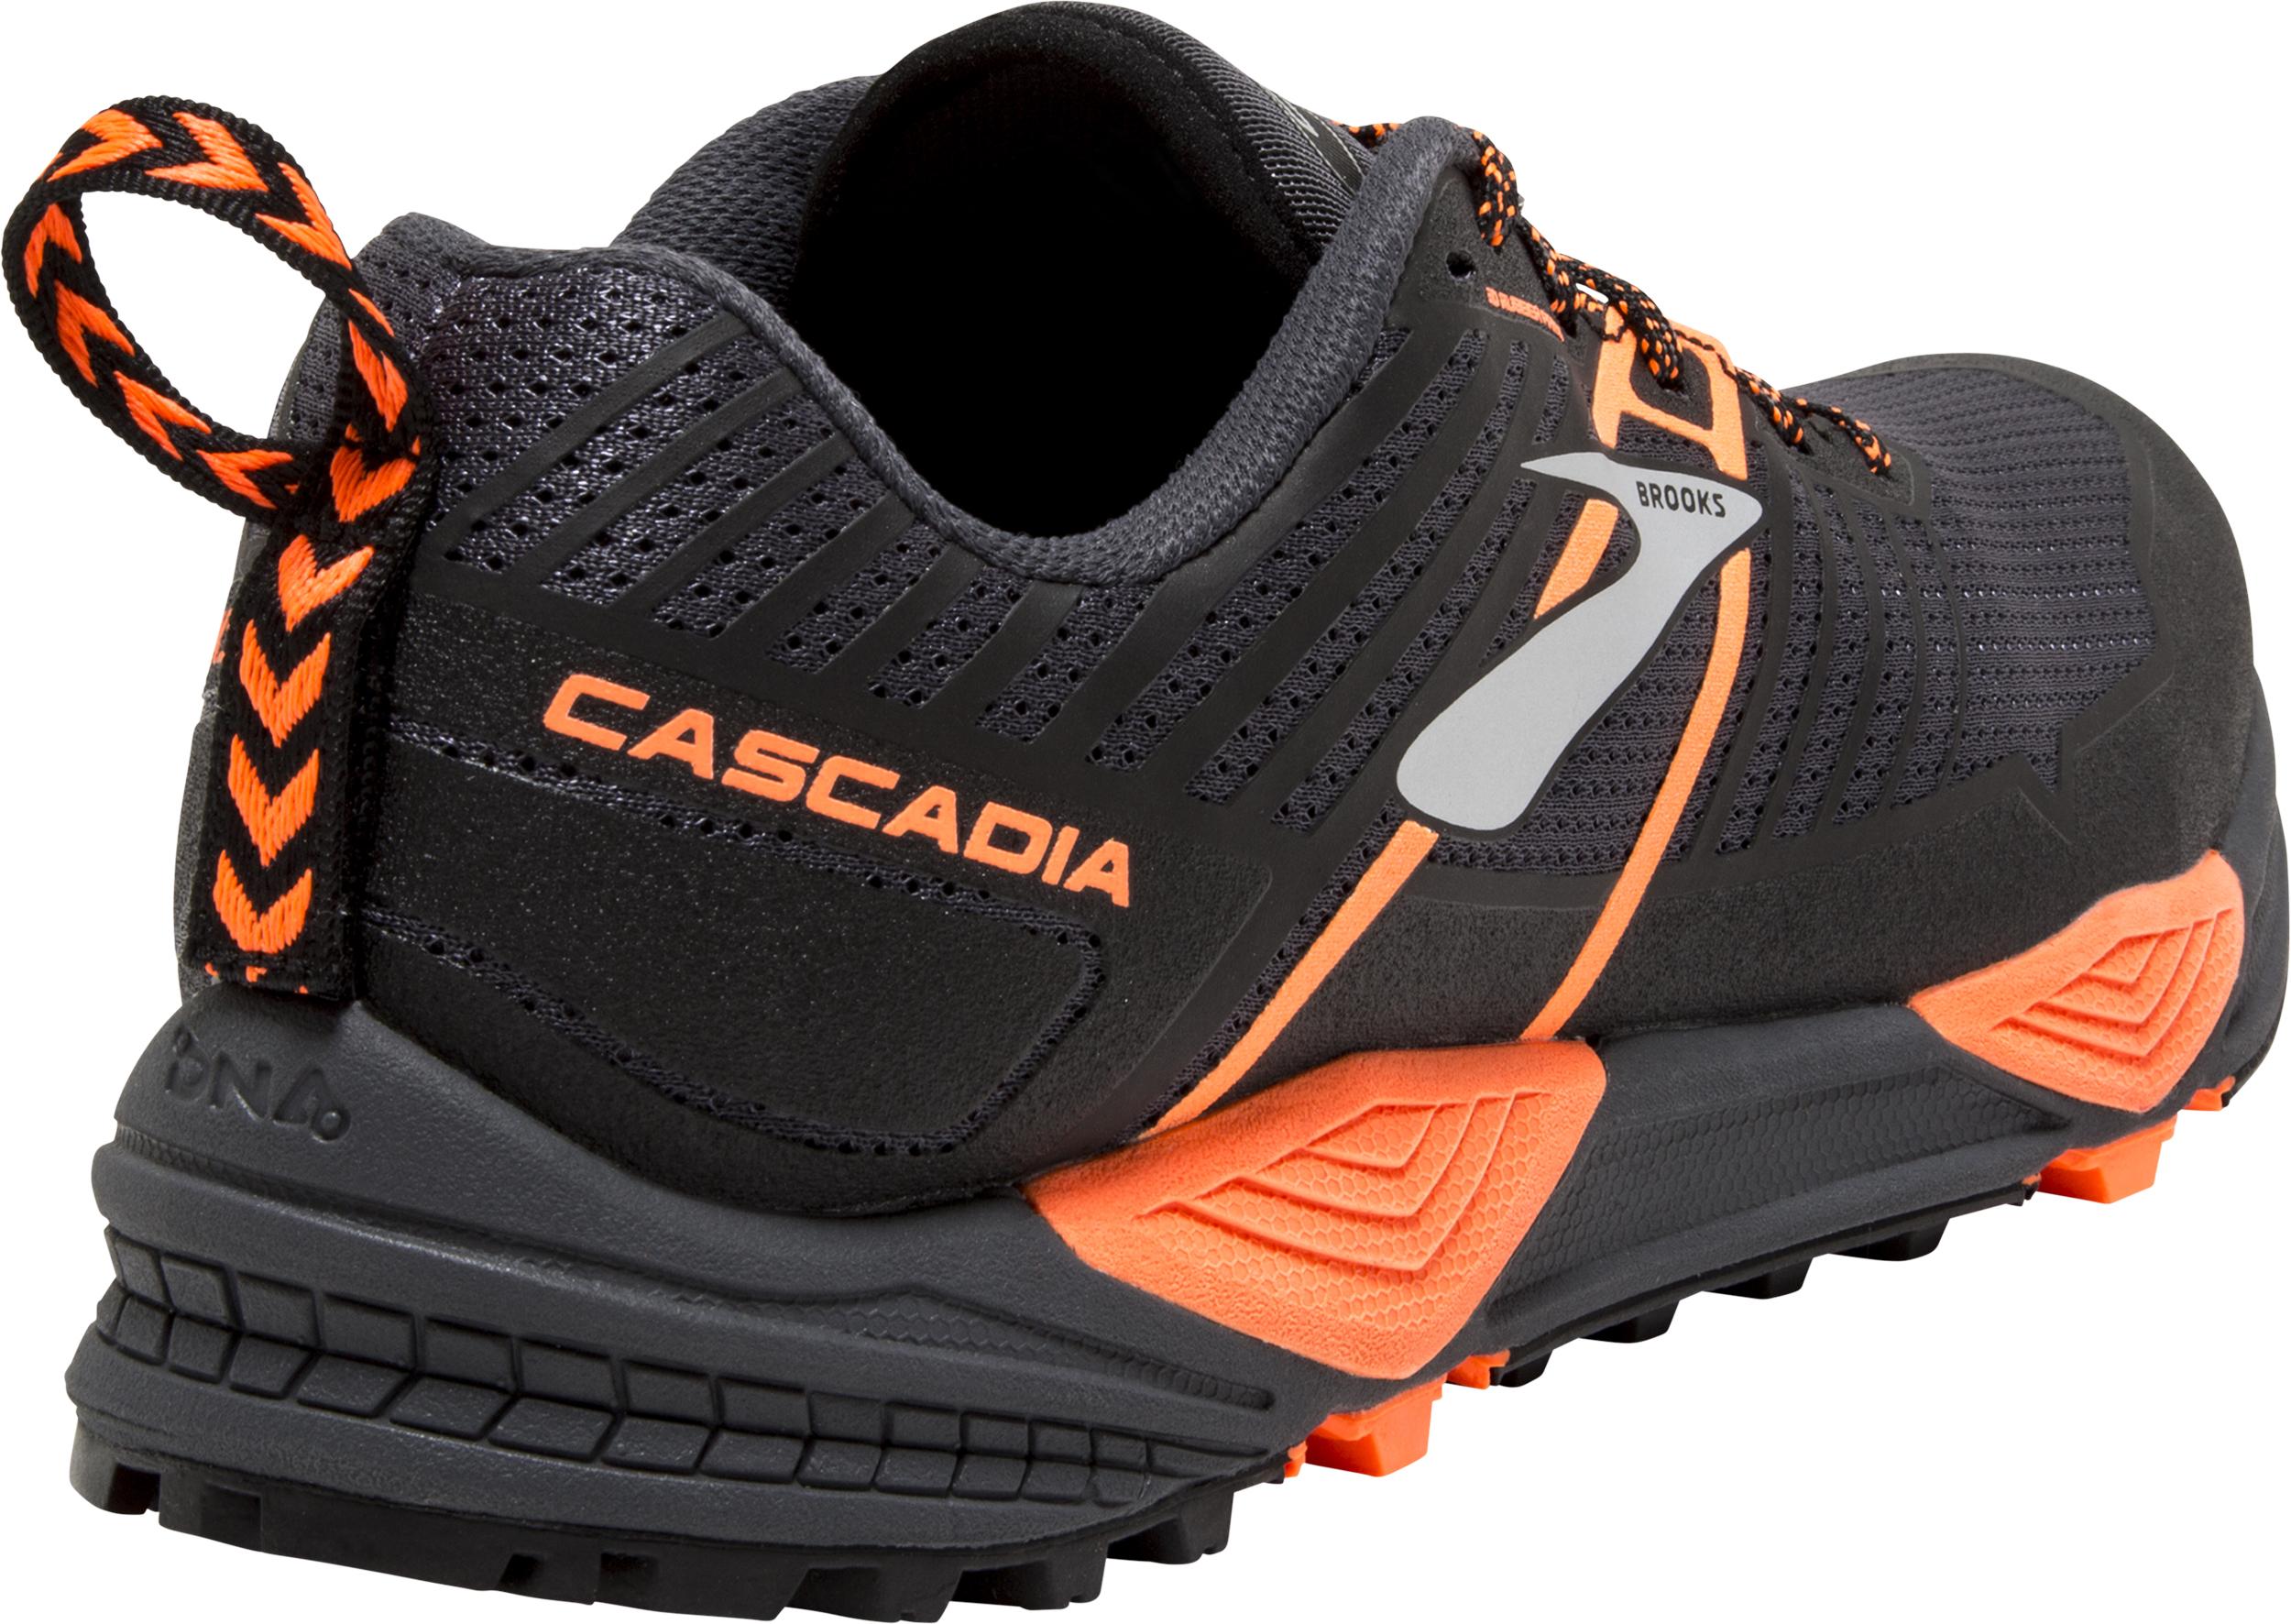 969007b1635 Brooks Cascadia 13 Trail Running Shoes - Men s